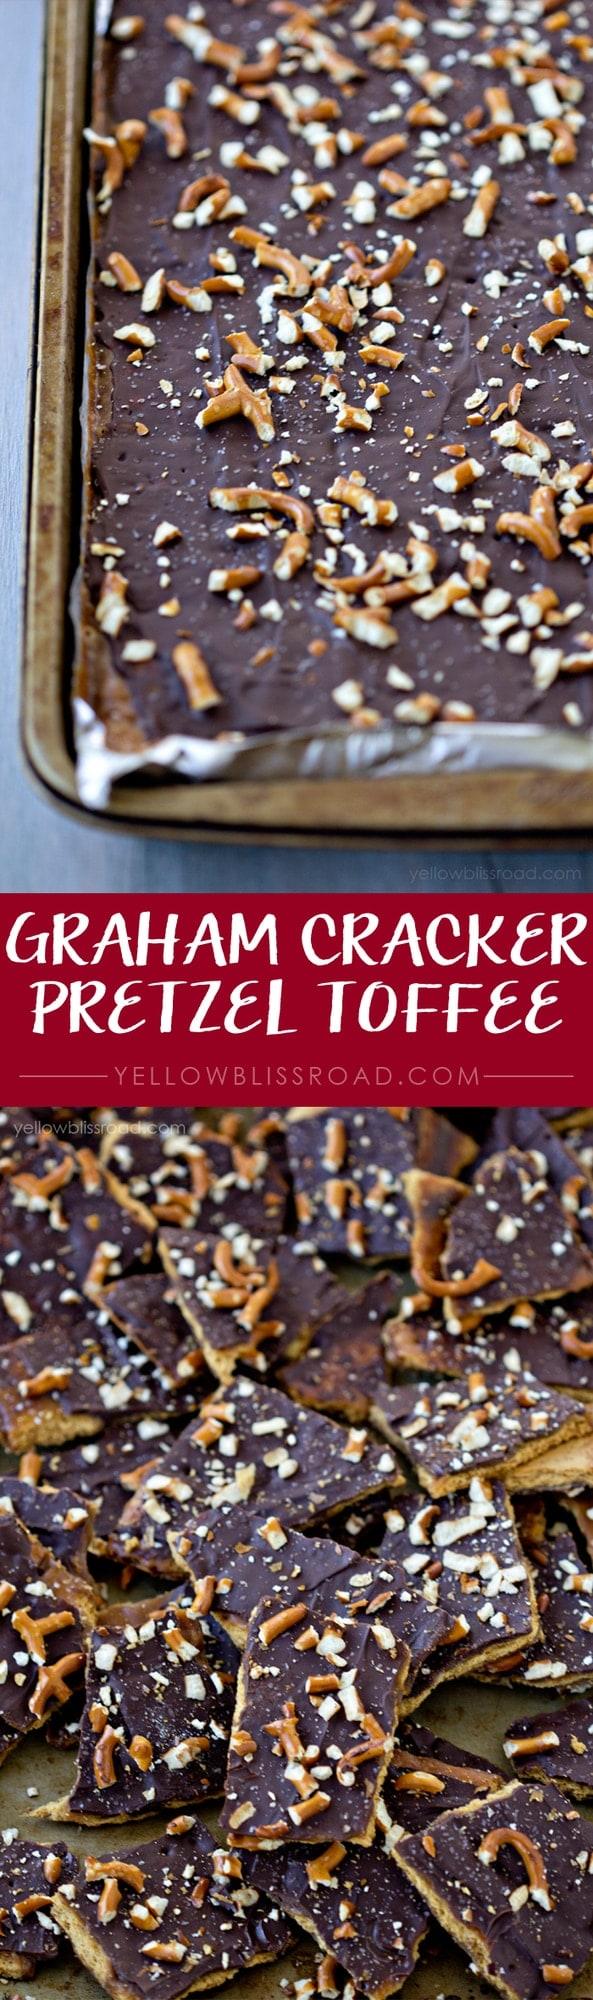 Graham Cracker Pretzel Toffee with Sea Salt